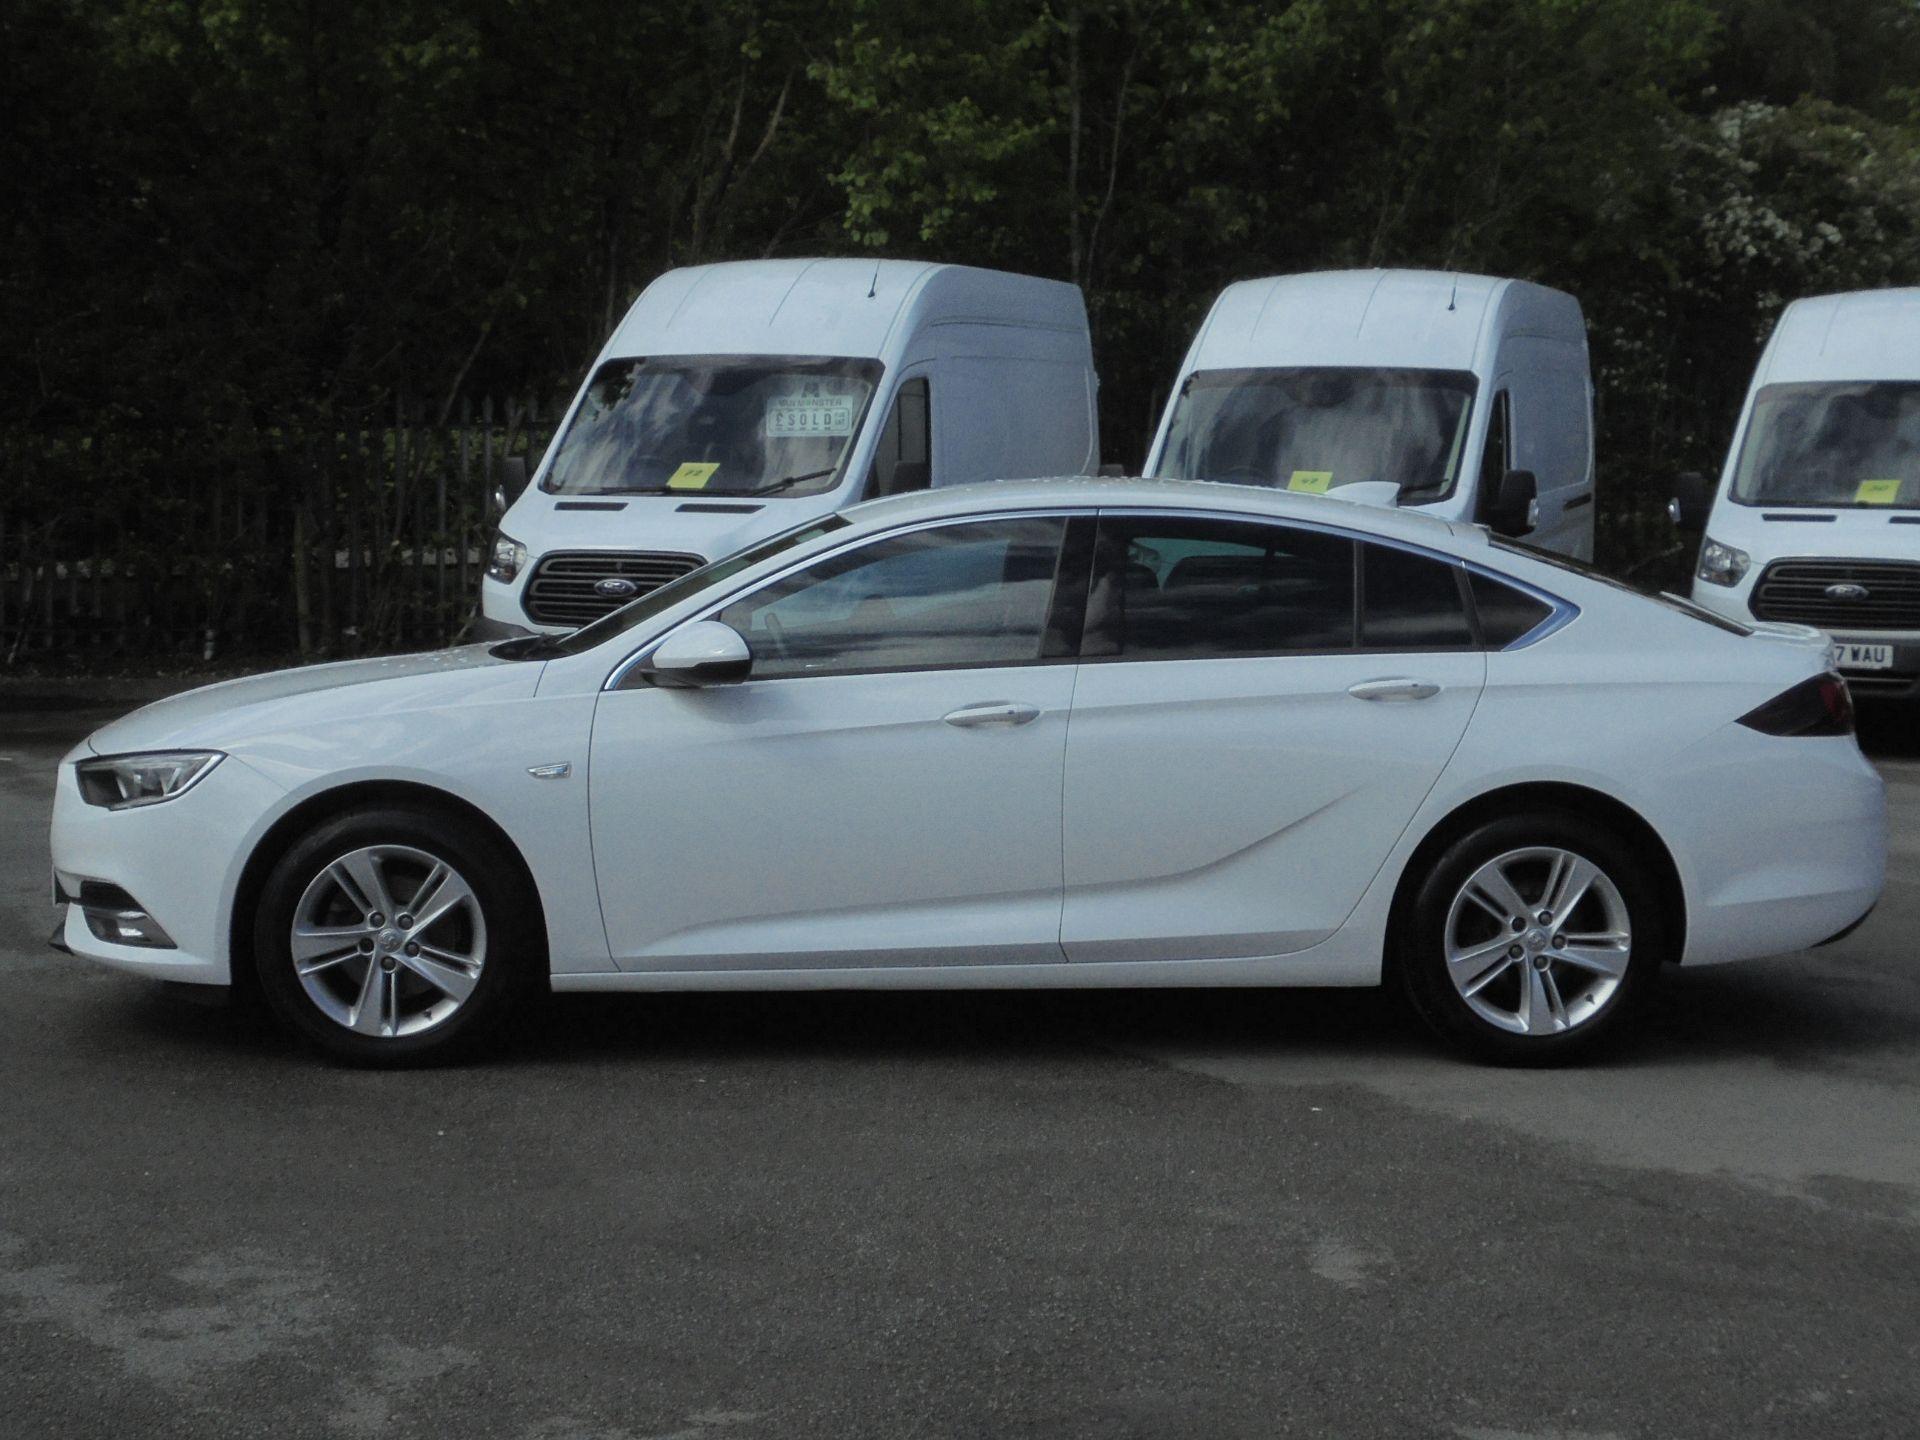 2018 Vauxhall Insignia Grand Sport 1.6 Turbo D Ecotec [136] Sri Nav 5Dr (VU18DFF) Image 4